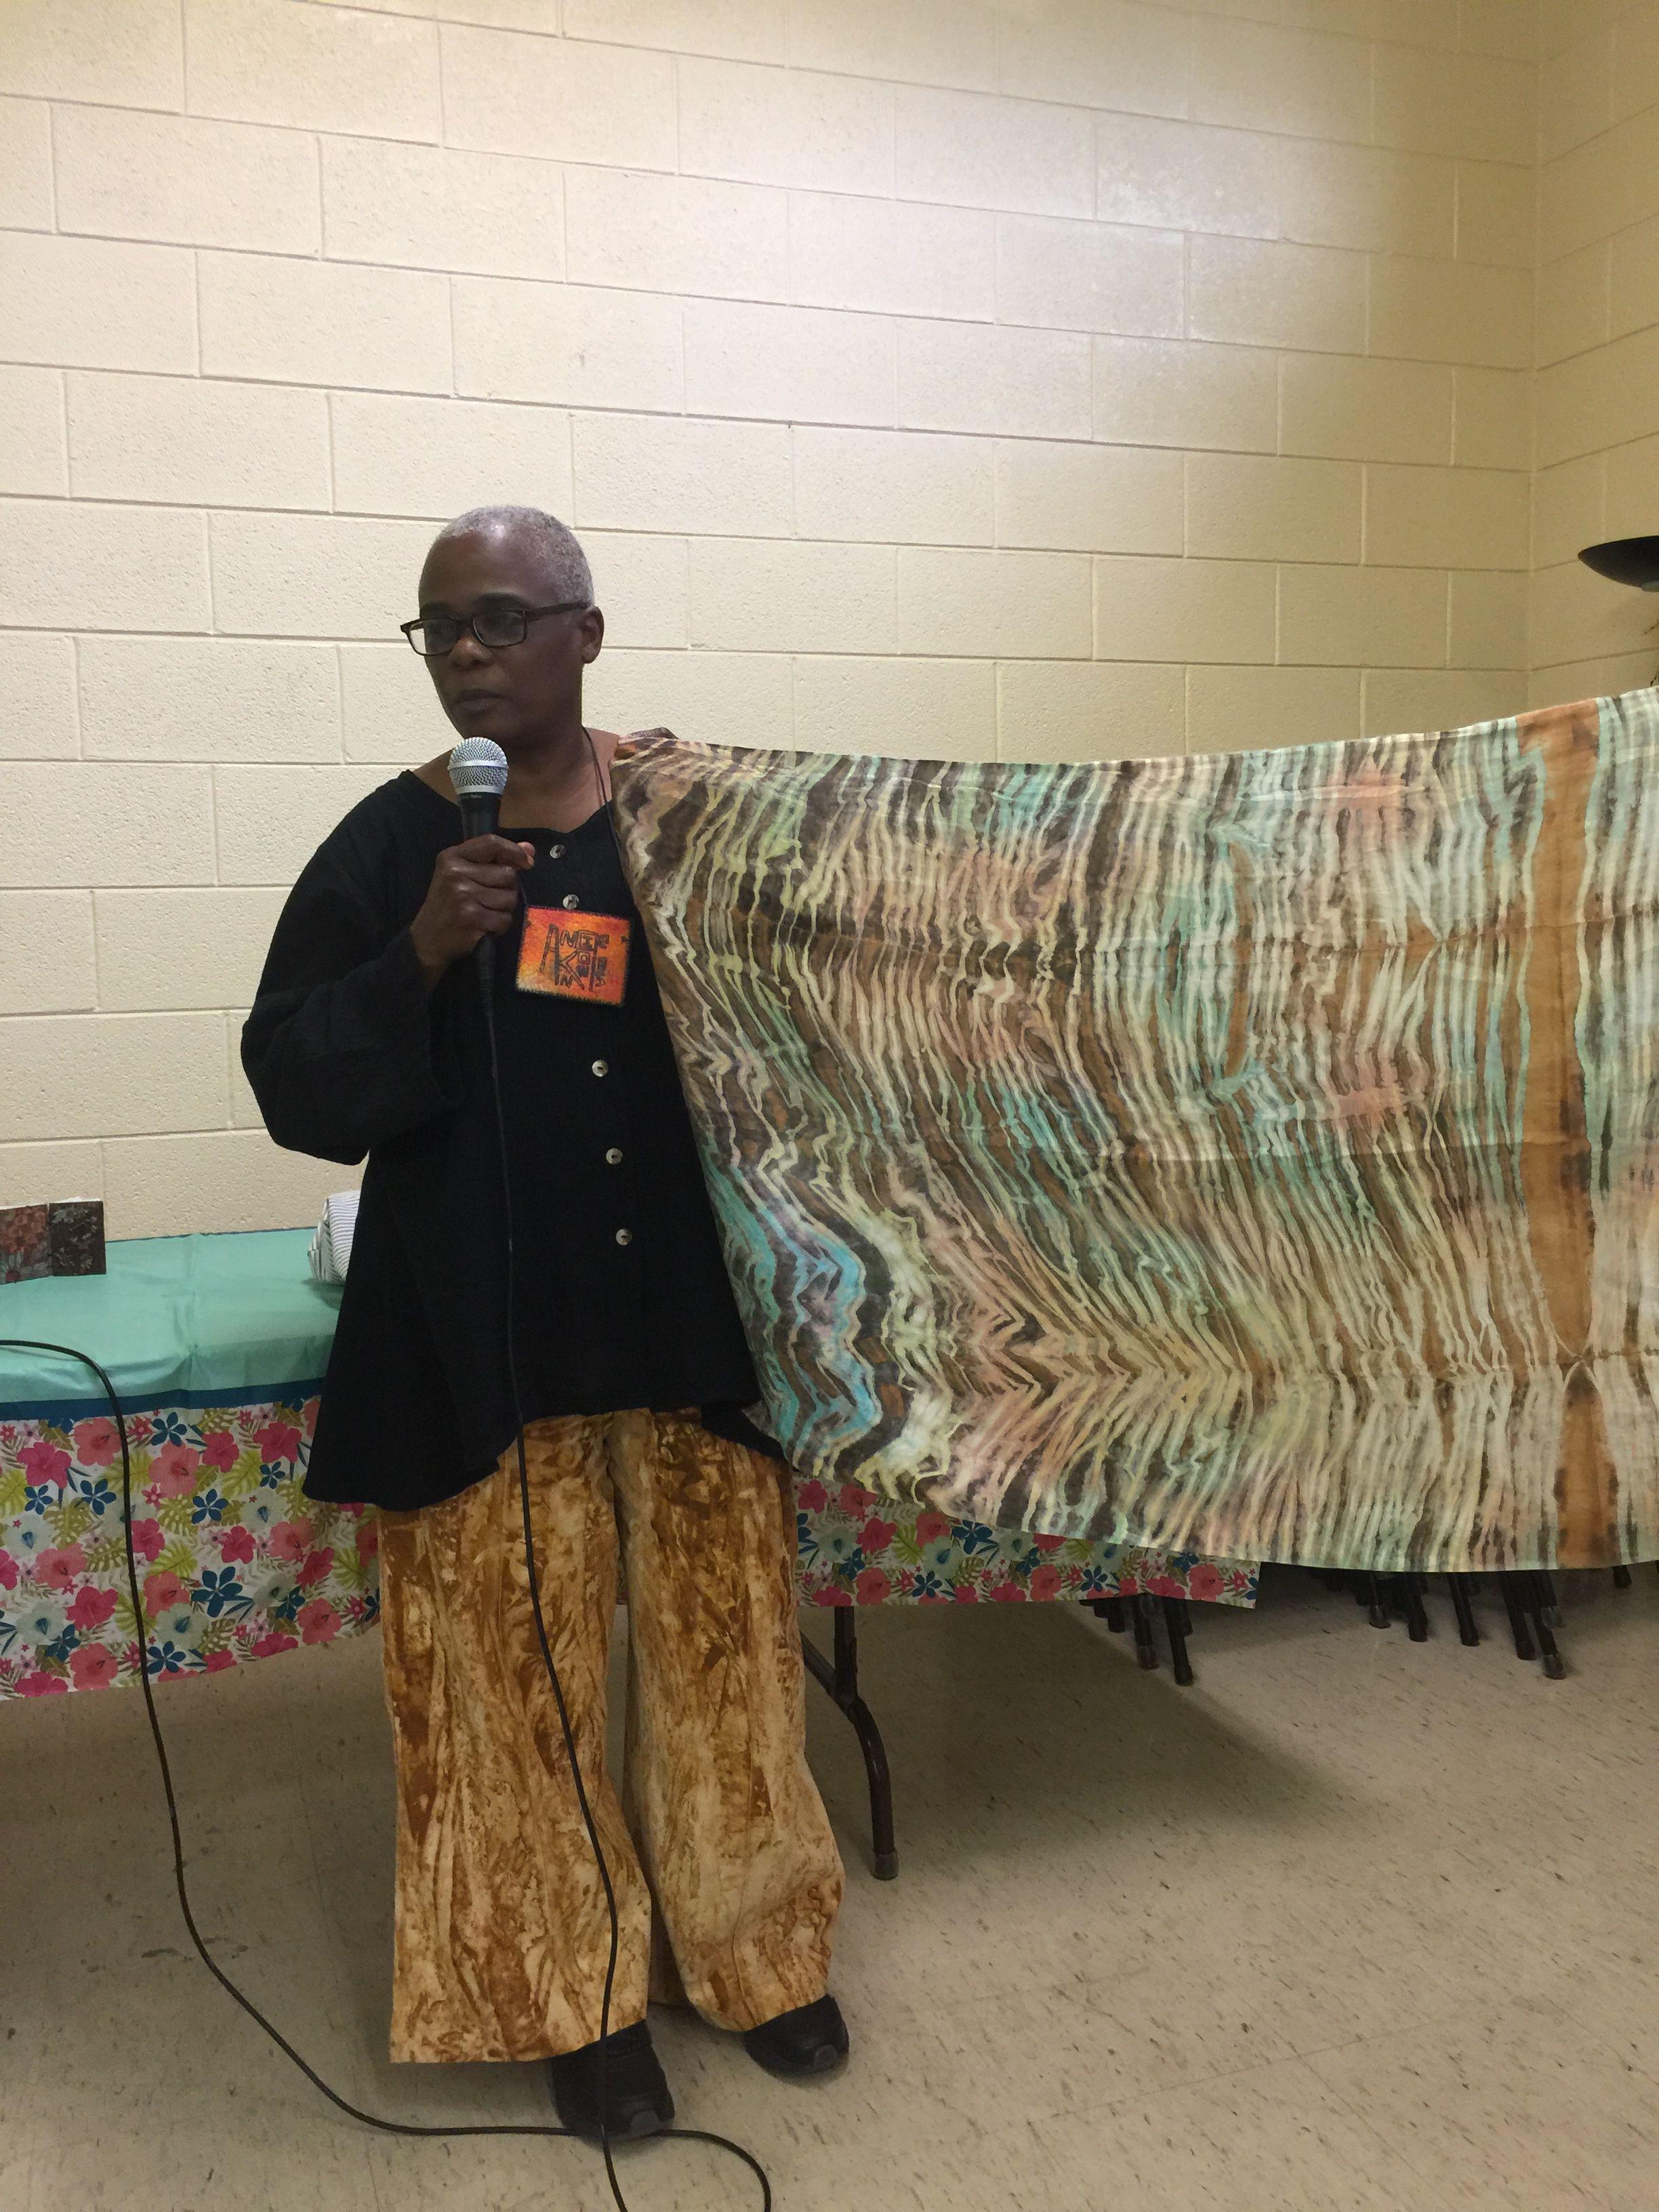 13+ Osceola school of the arts phone number ideas